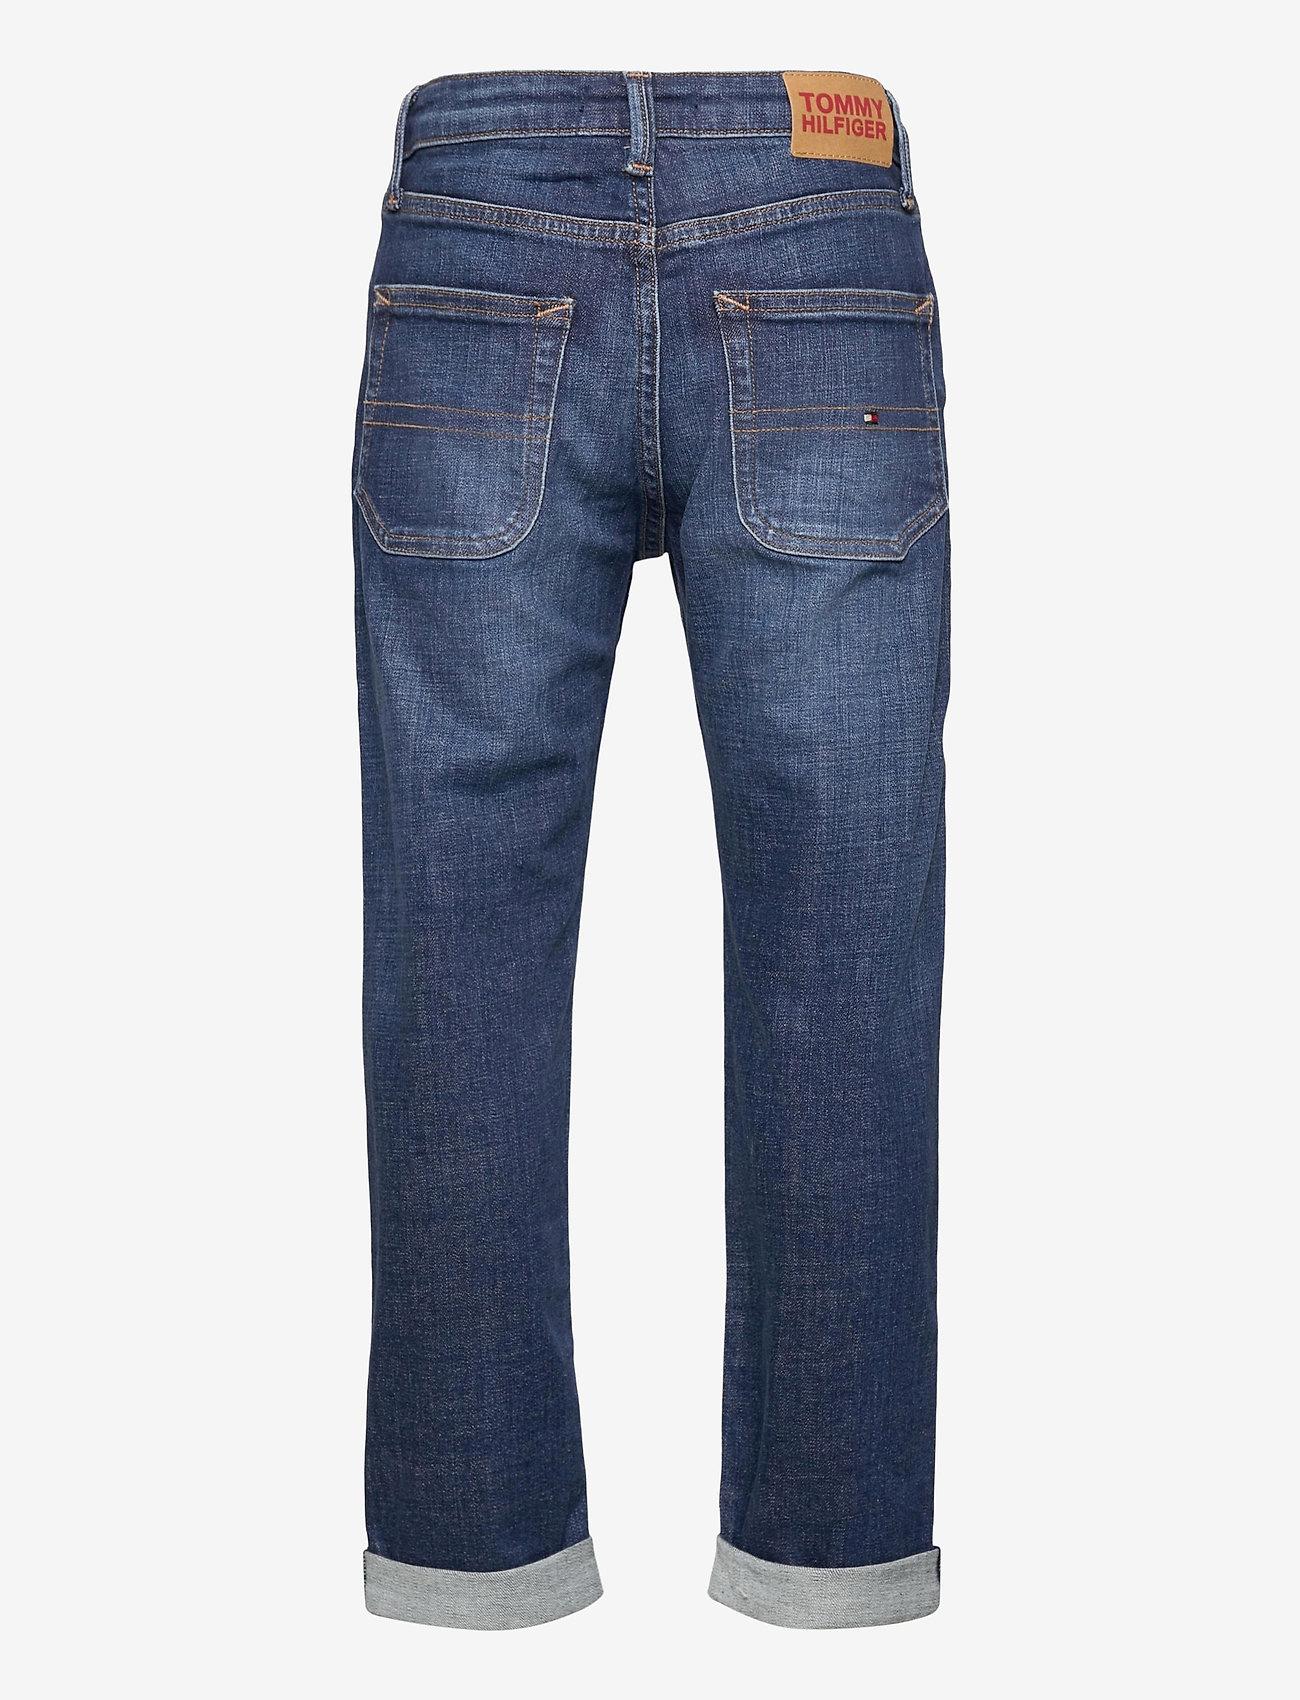 Tommy Hilfiger - MODERN STRAIGHT - jeans - summerdkbluestretch - 1